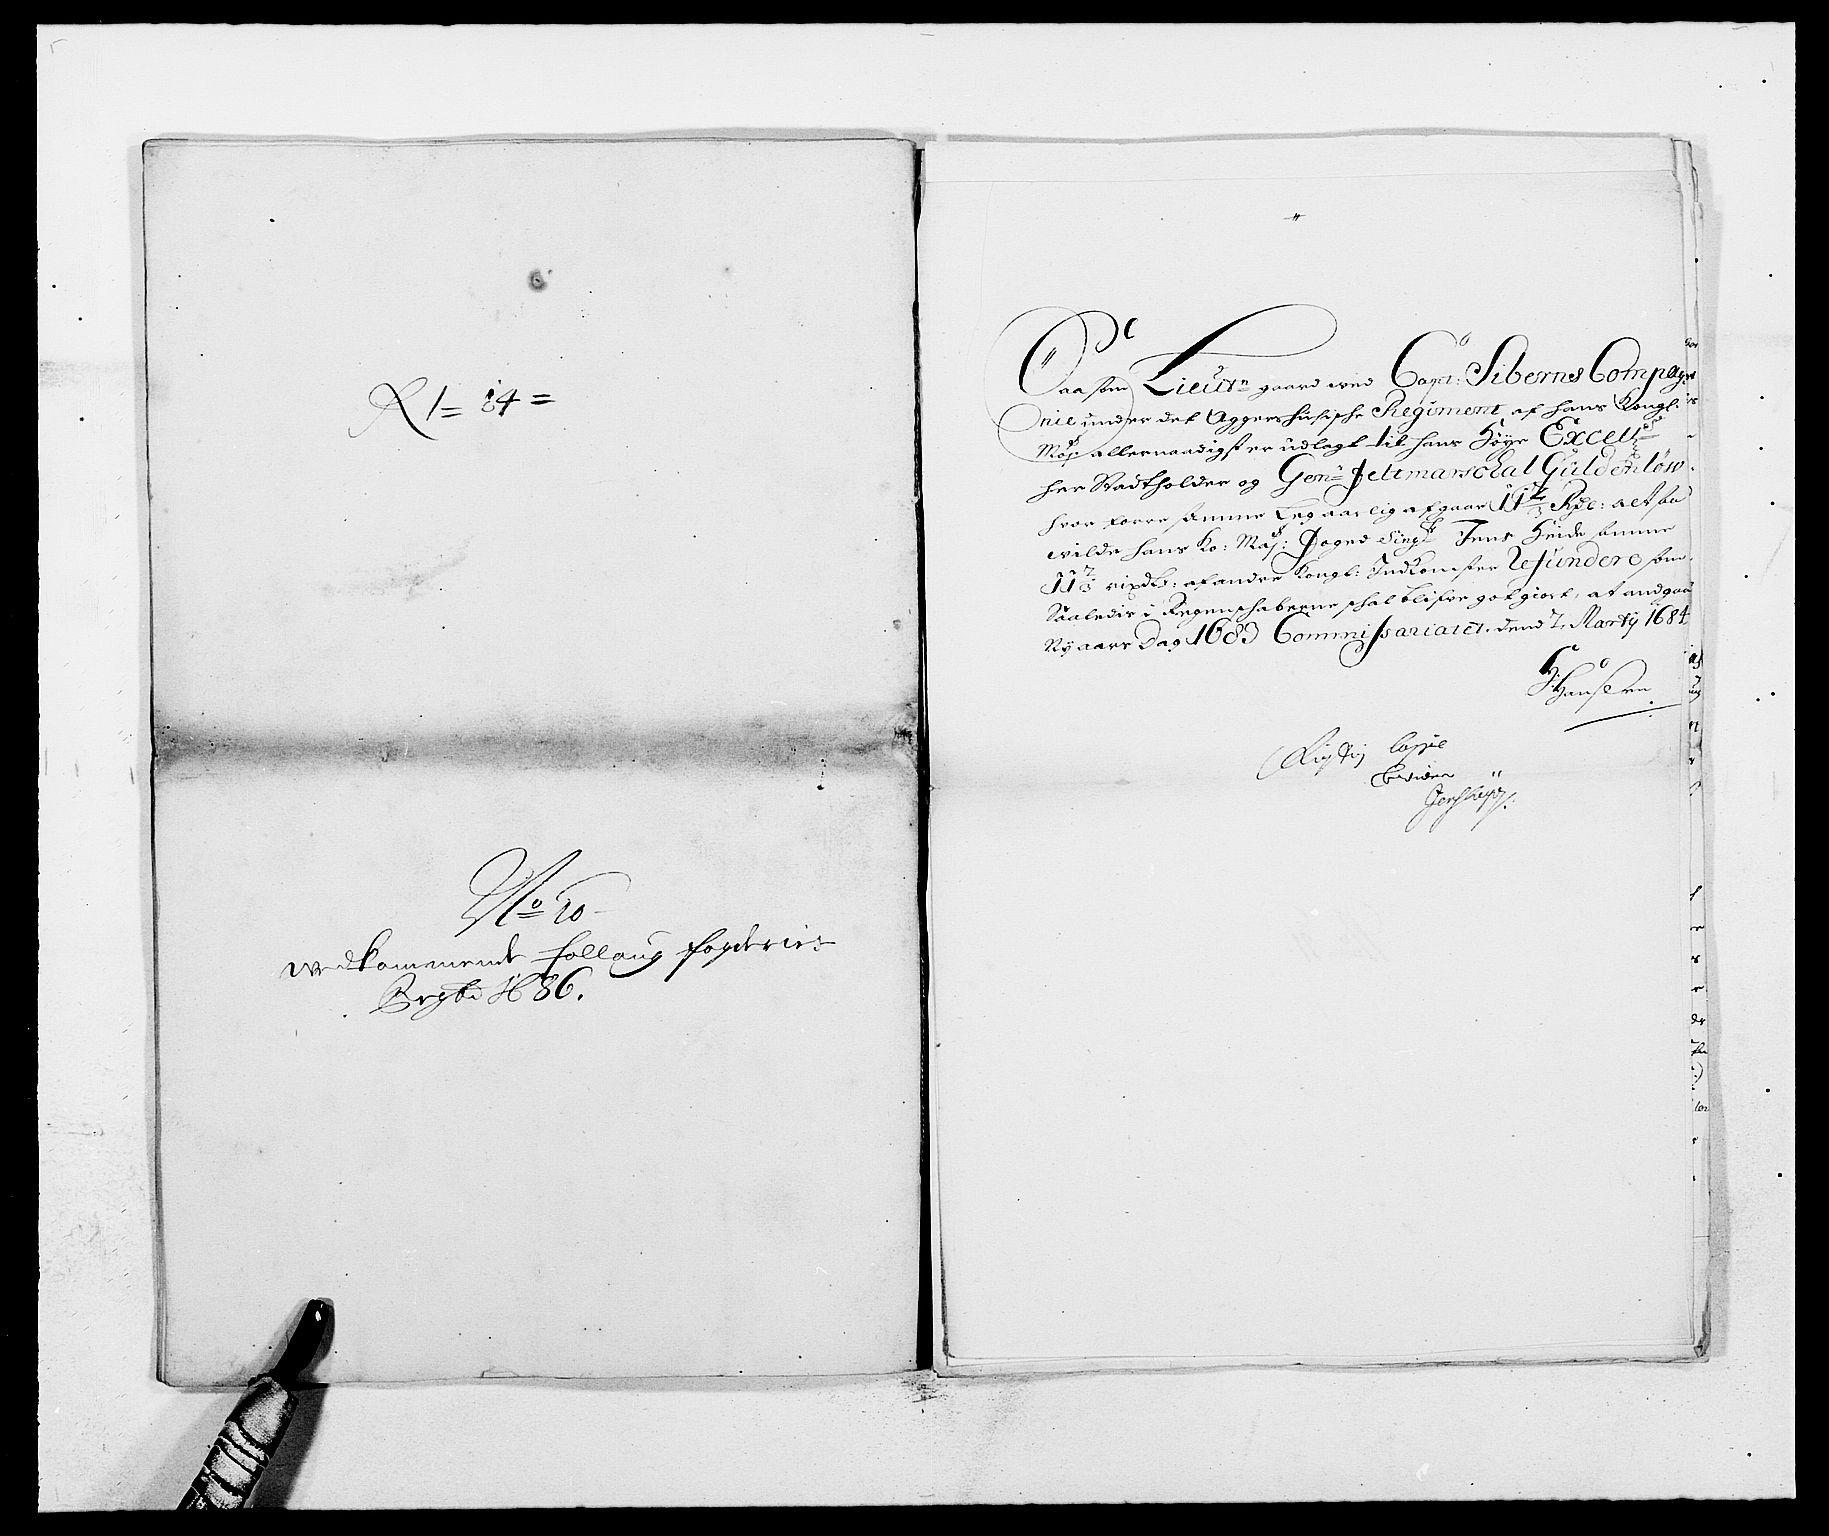 RA, Rentekammeret inntil 1814, Reviderte regnskaper, Fogderegnskap, R09/L0436: Fogderegnskap Follo, 1685-1691, s. 98